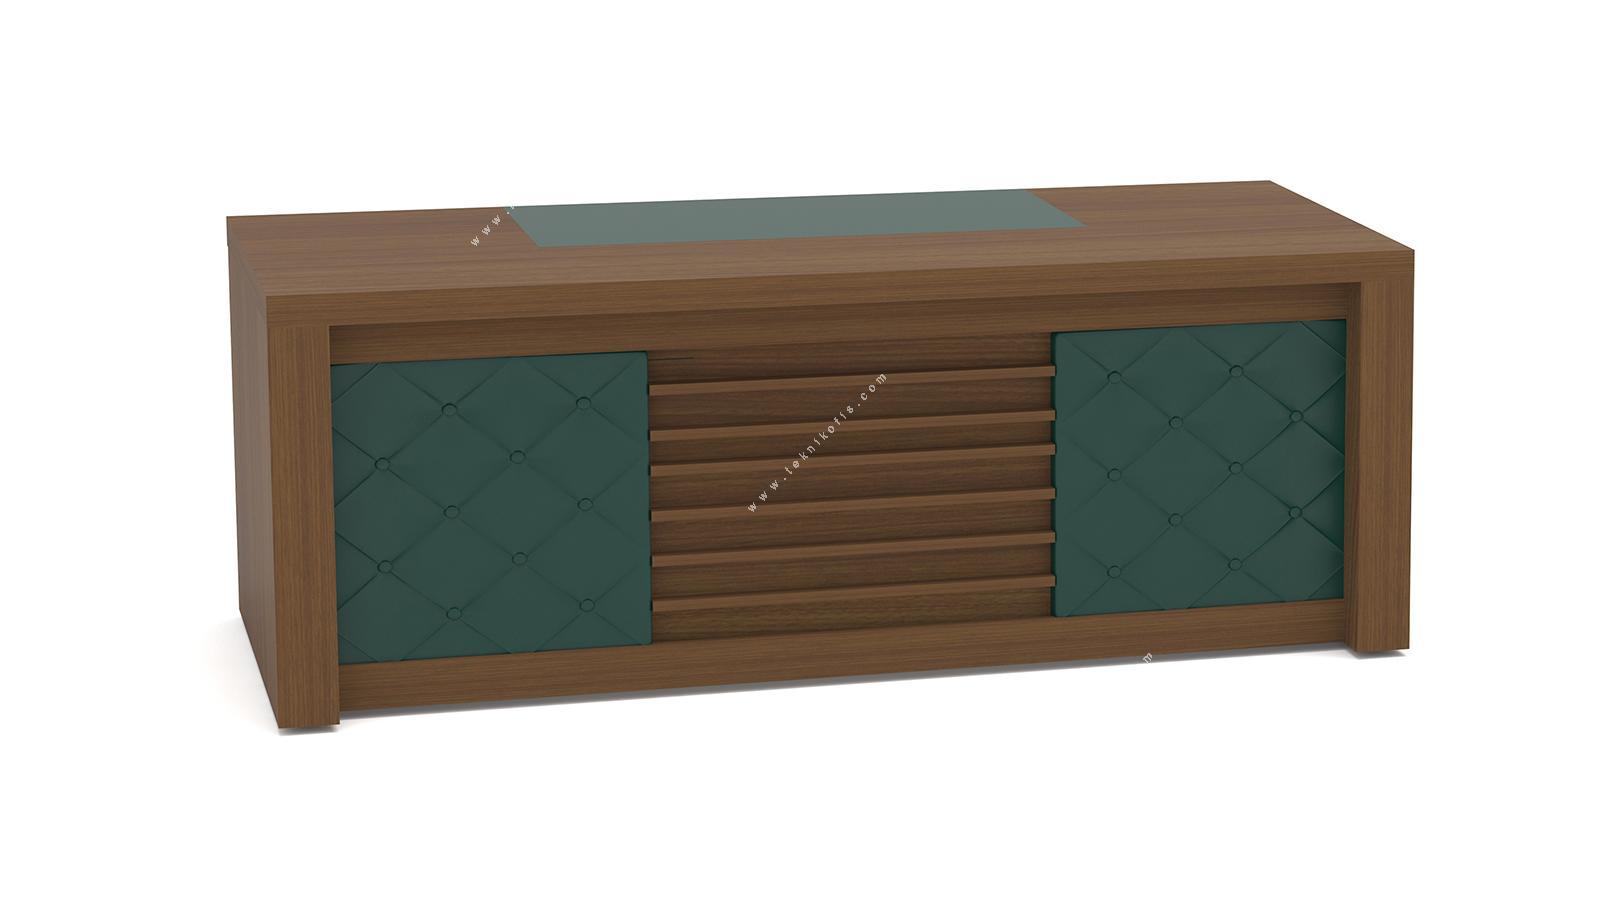 ranses makam masası 200cm